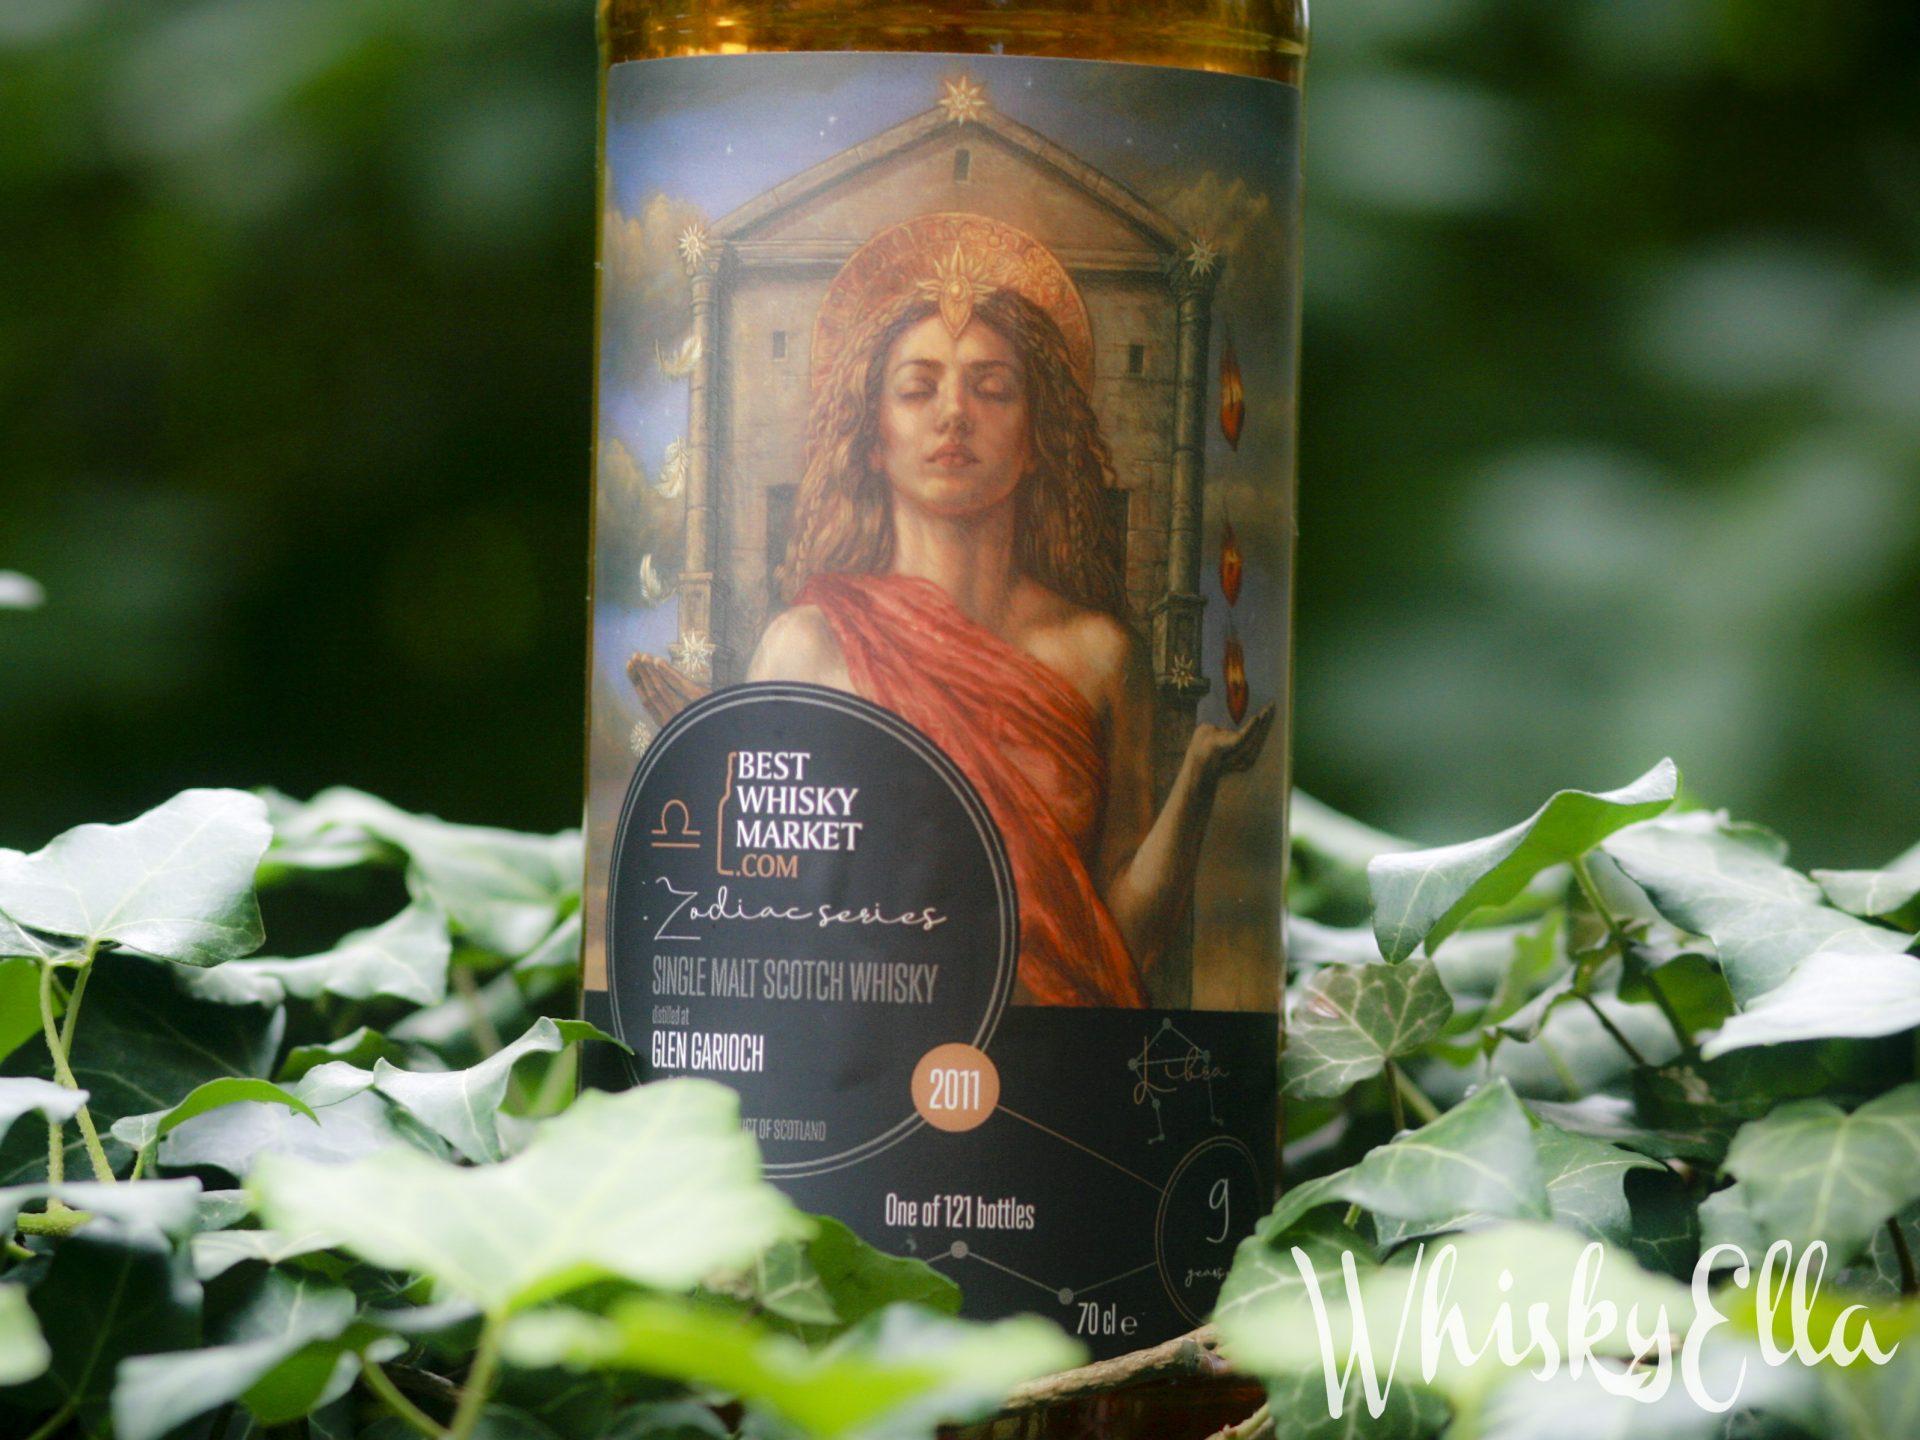 Nasza recenzja Glen Garioch 2011 9 yo Best Whisky Market Zodiac Series – Libra #114